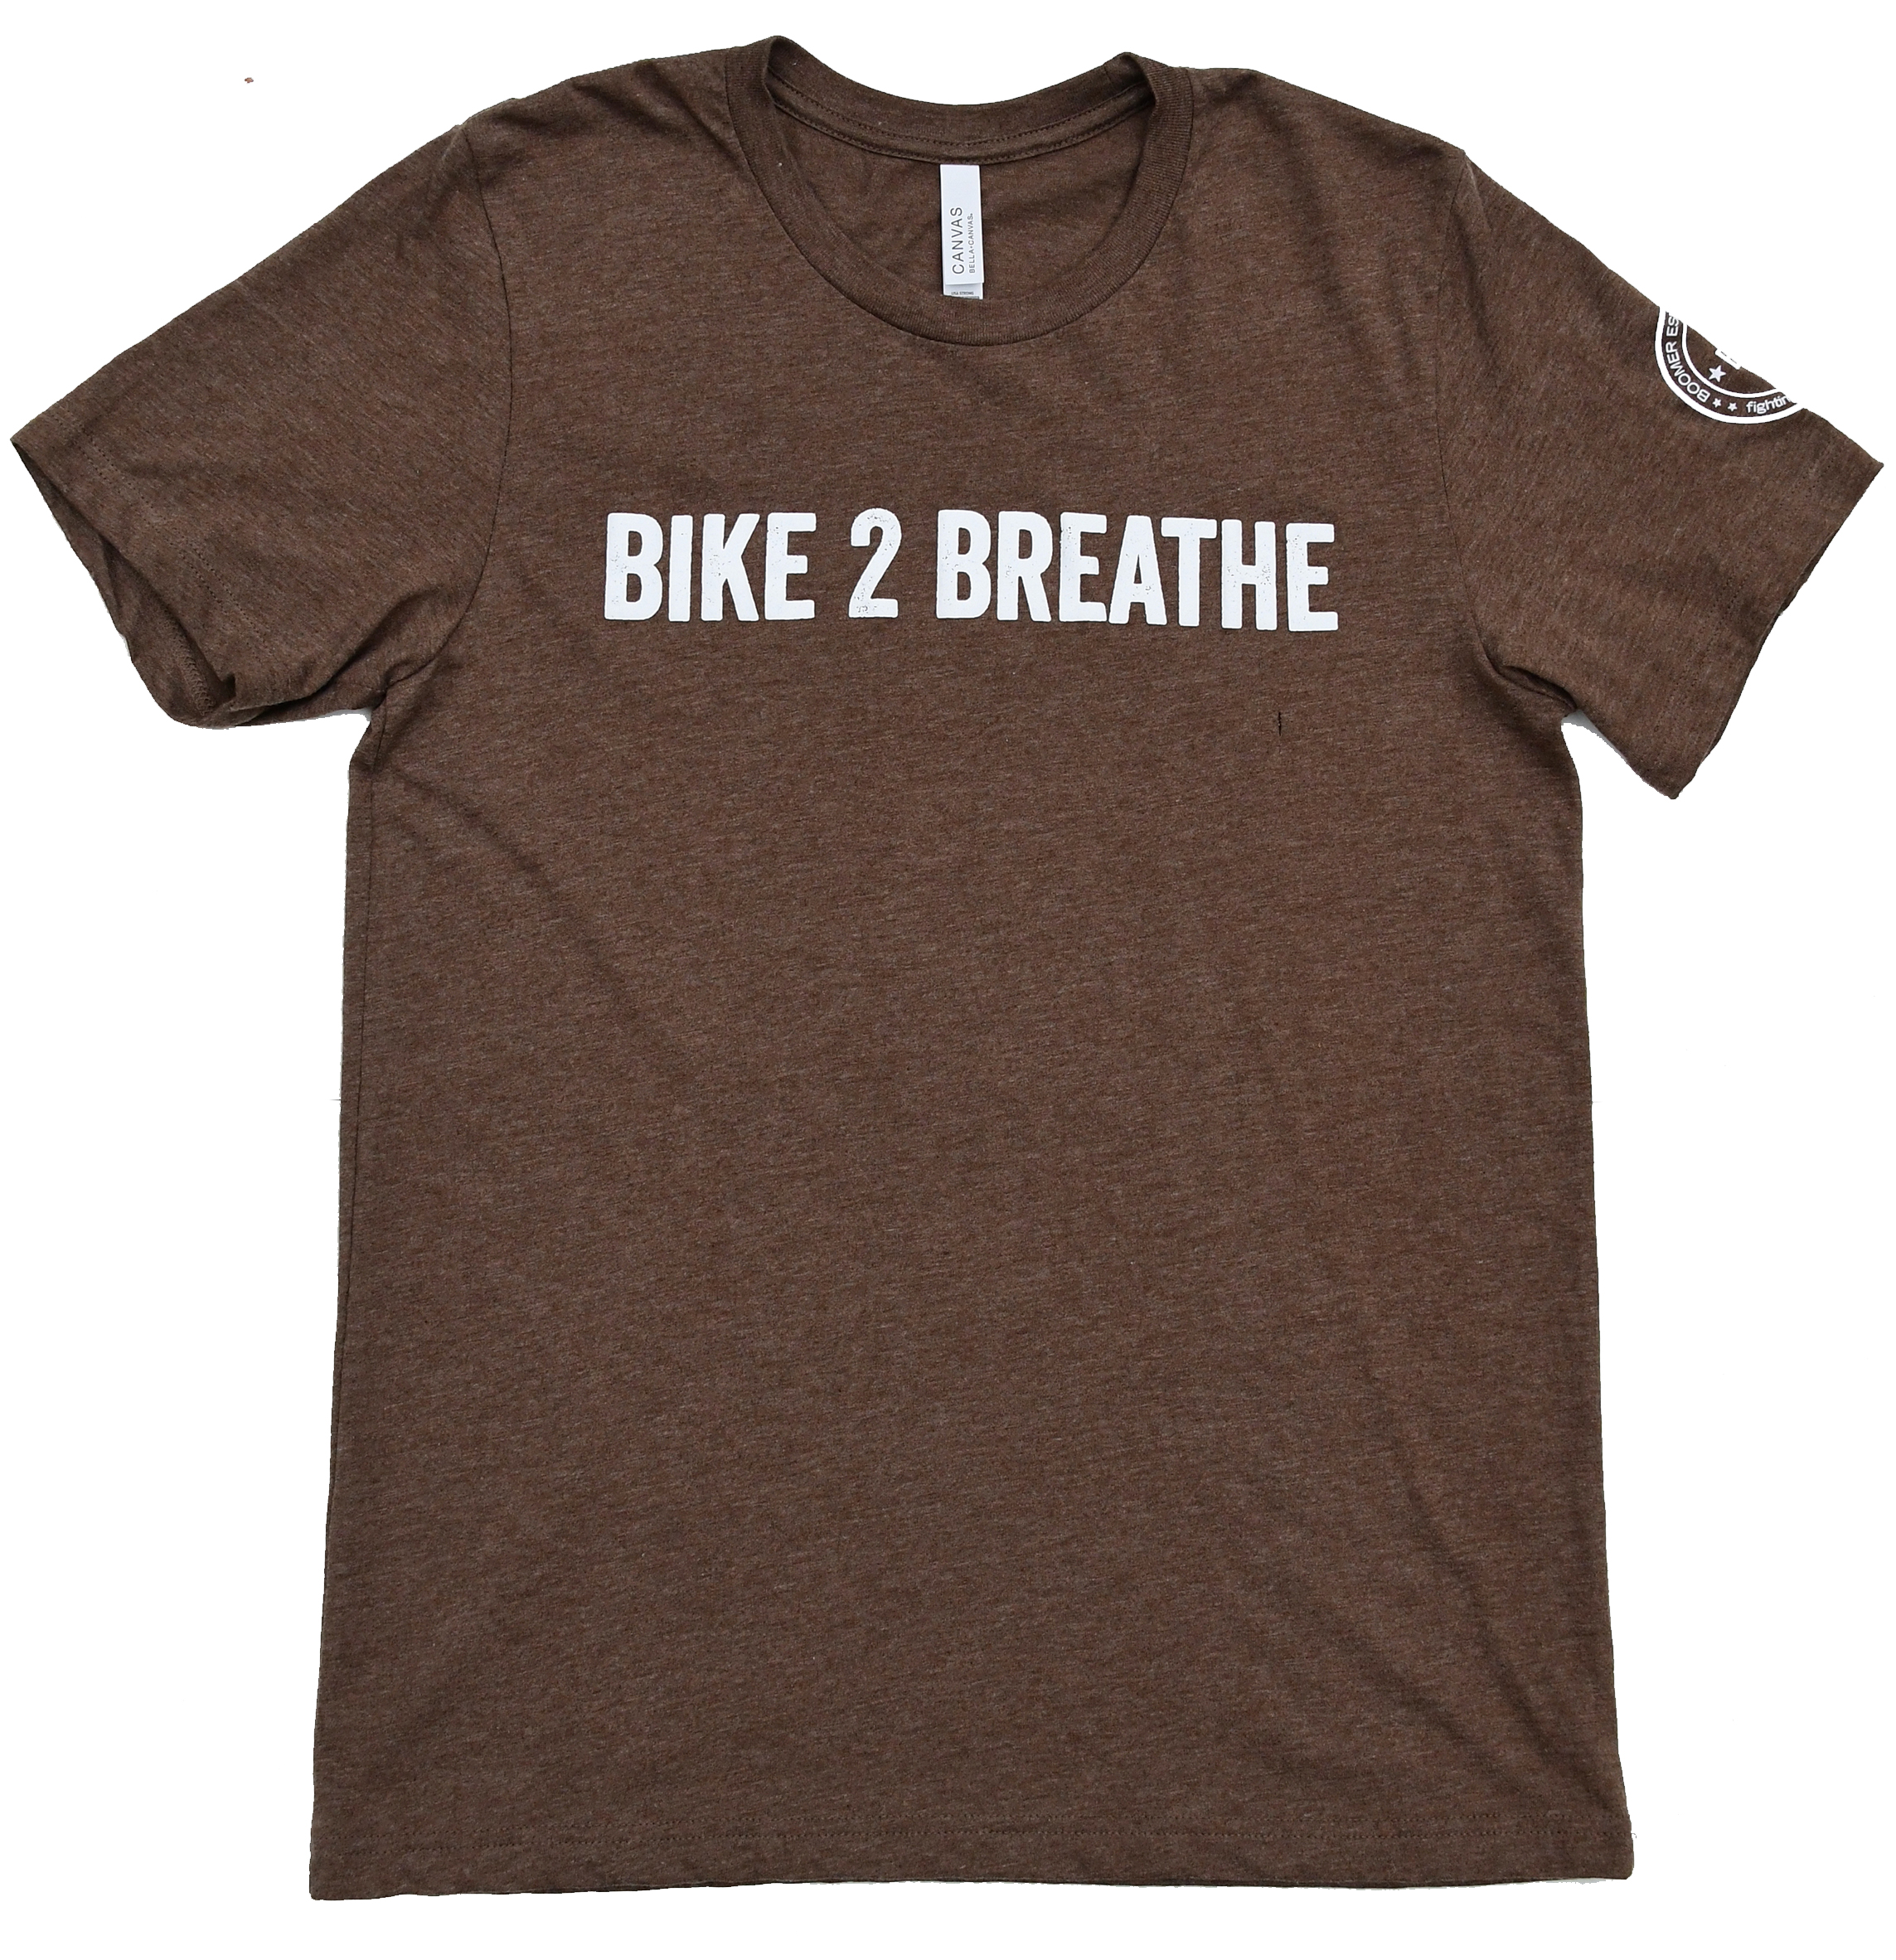 Bike 2 Breathe Spring Shirts